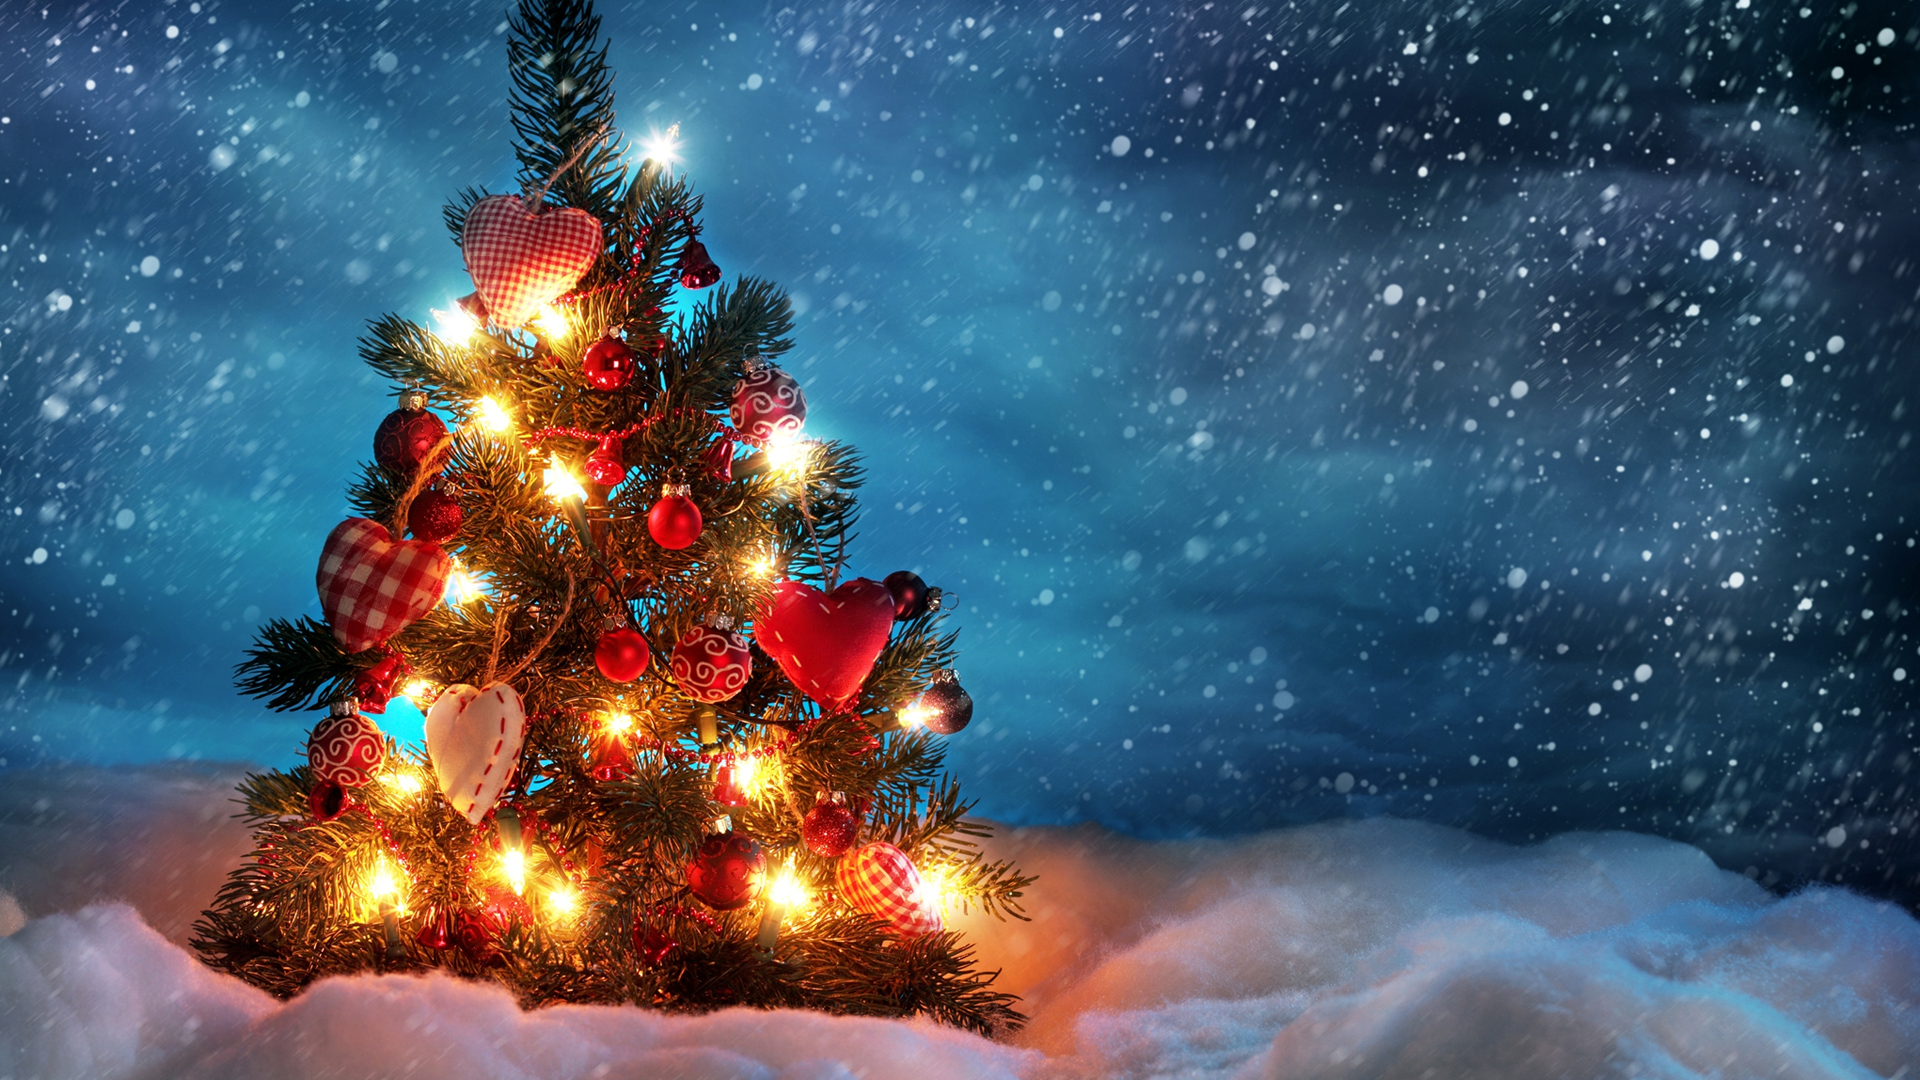 Christmas Backgrounds Best for Kodi 4